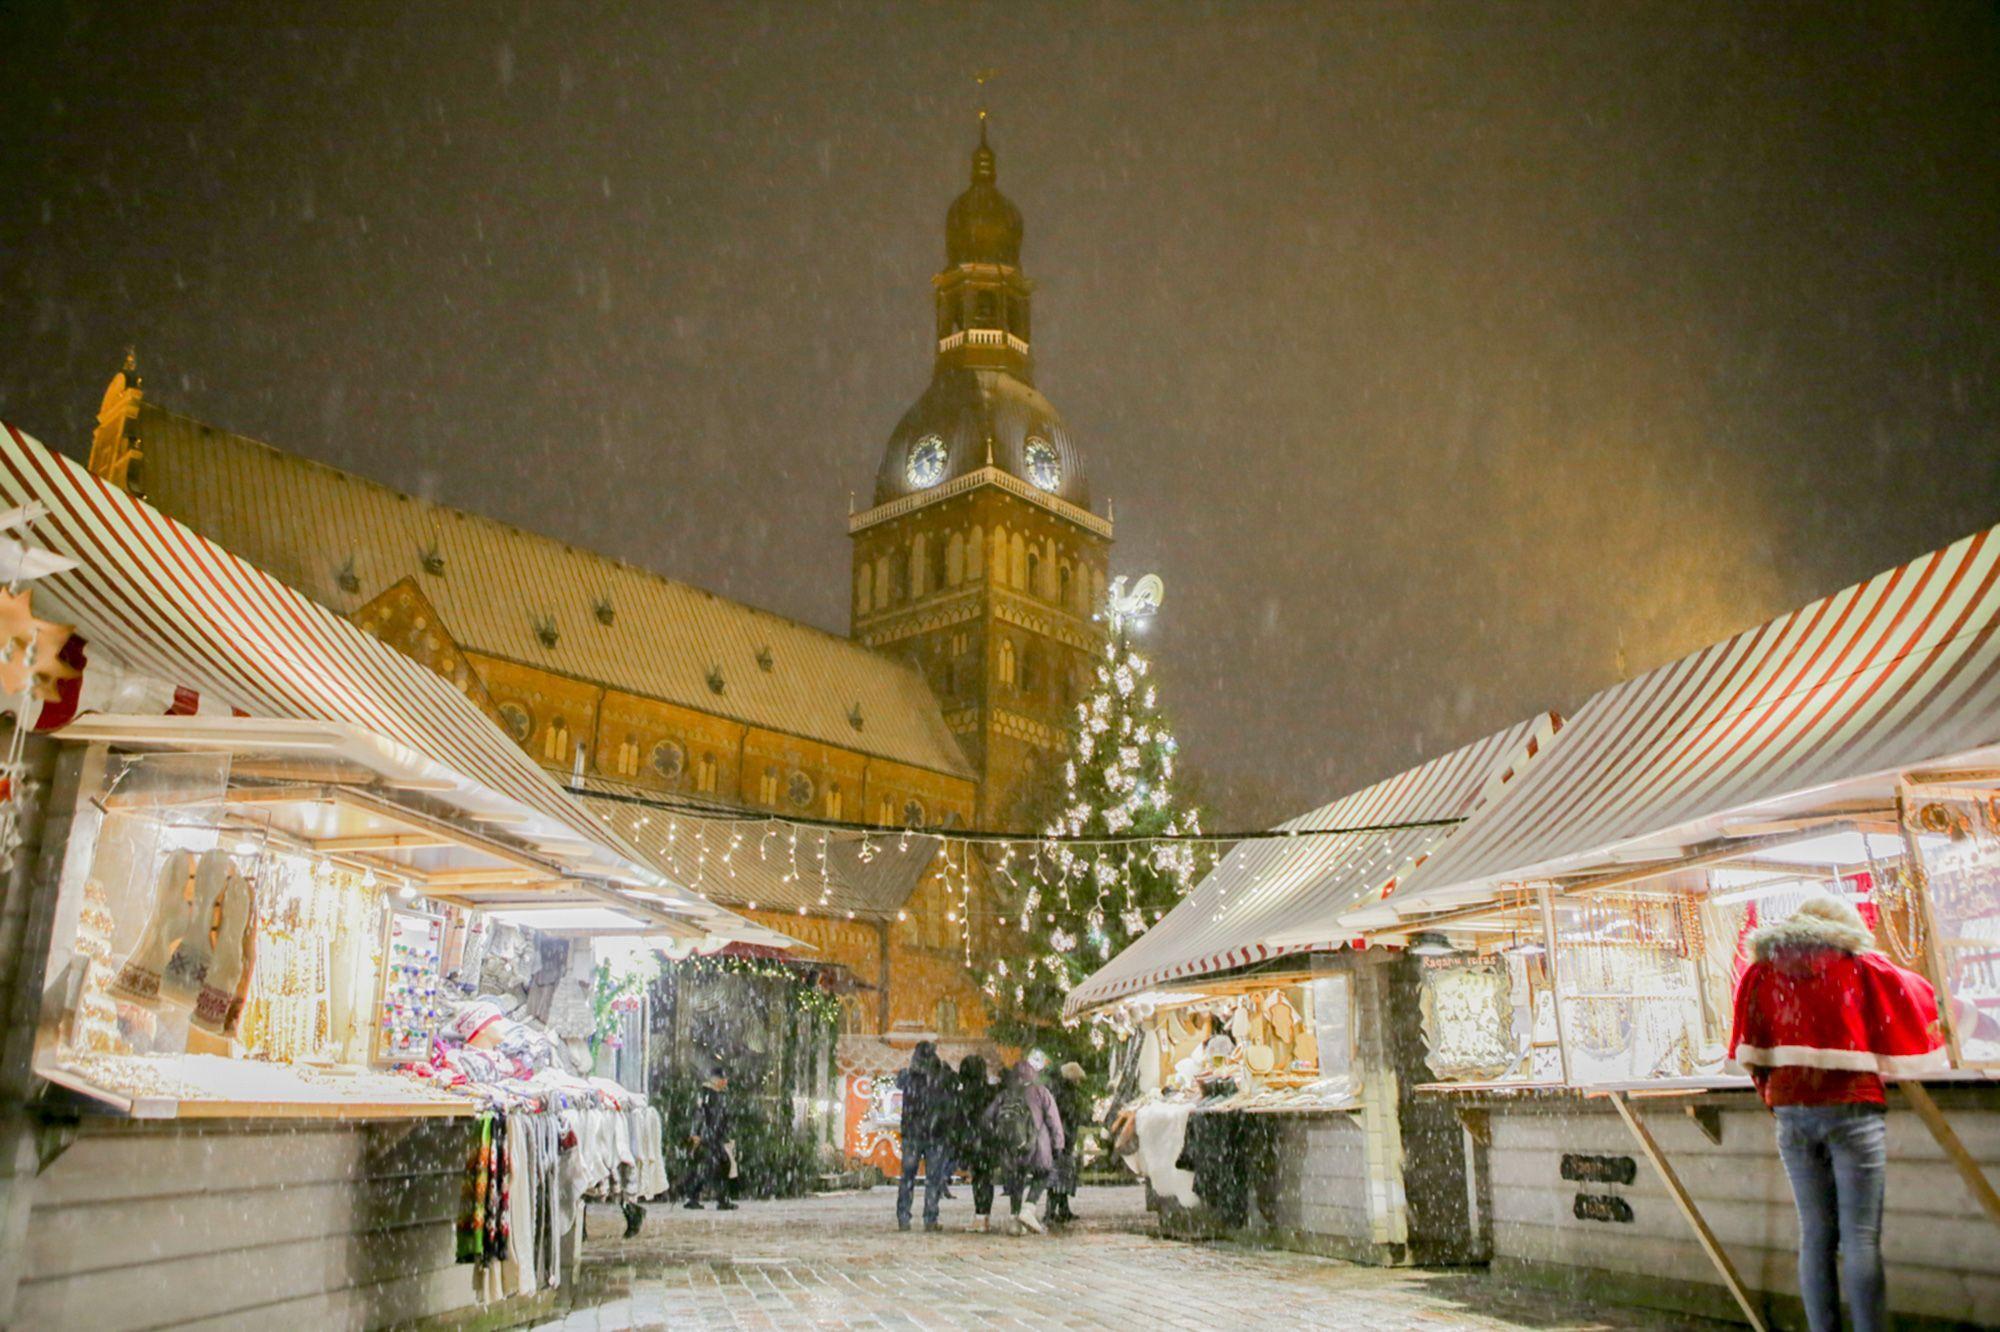 Agences de rencontres en Lettonie